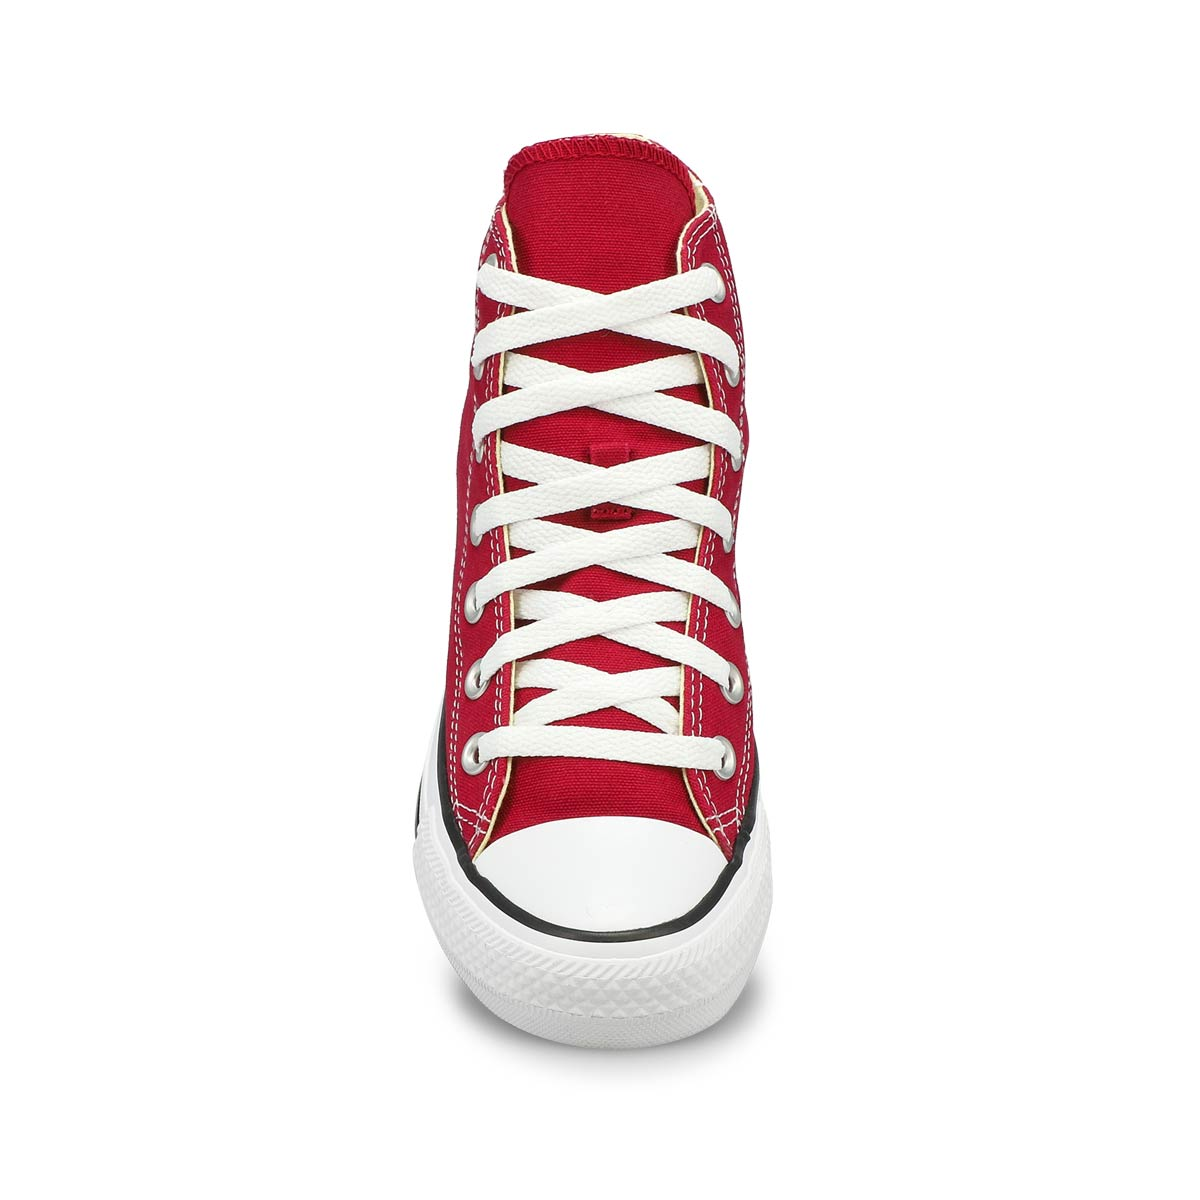 Women's Chuck Taylor All Star Hi Top Sneaker